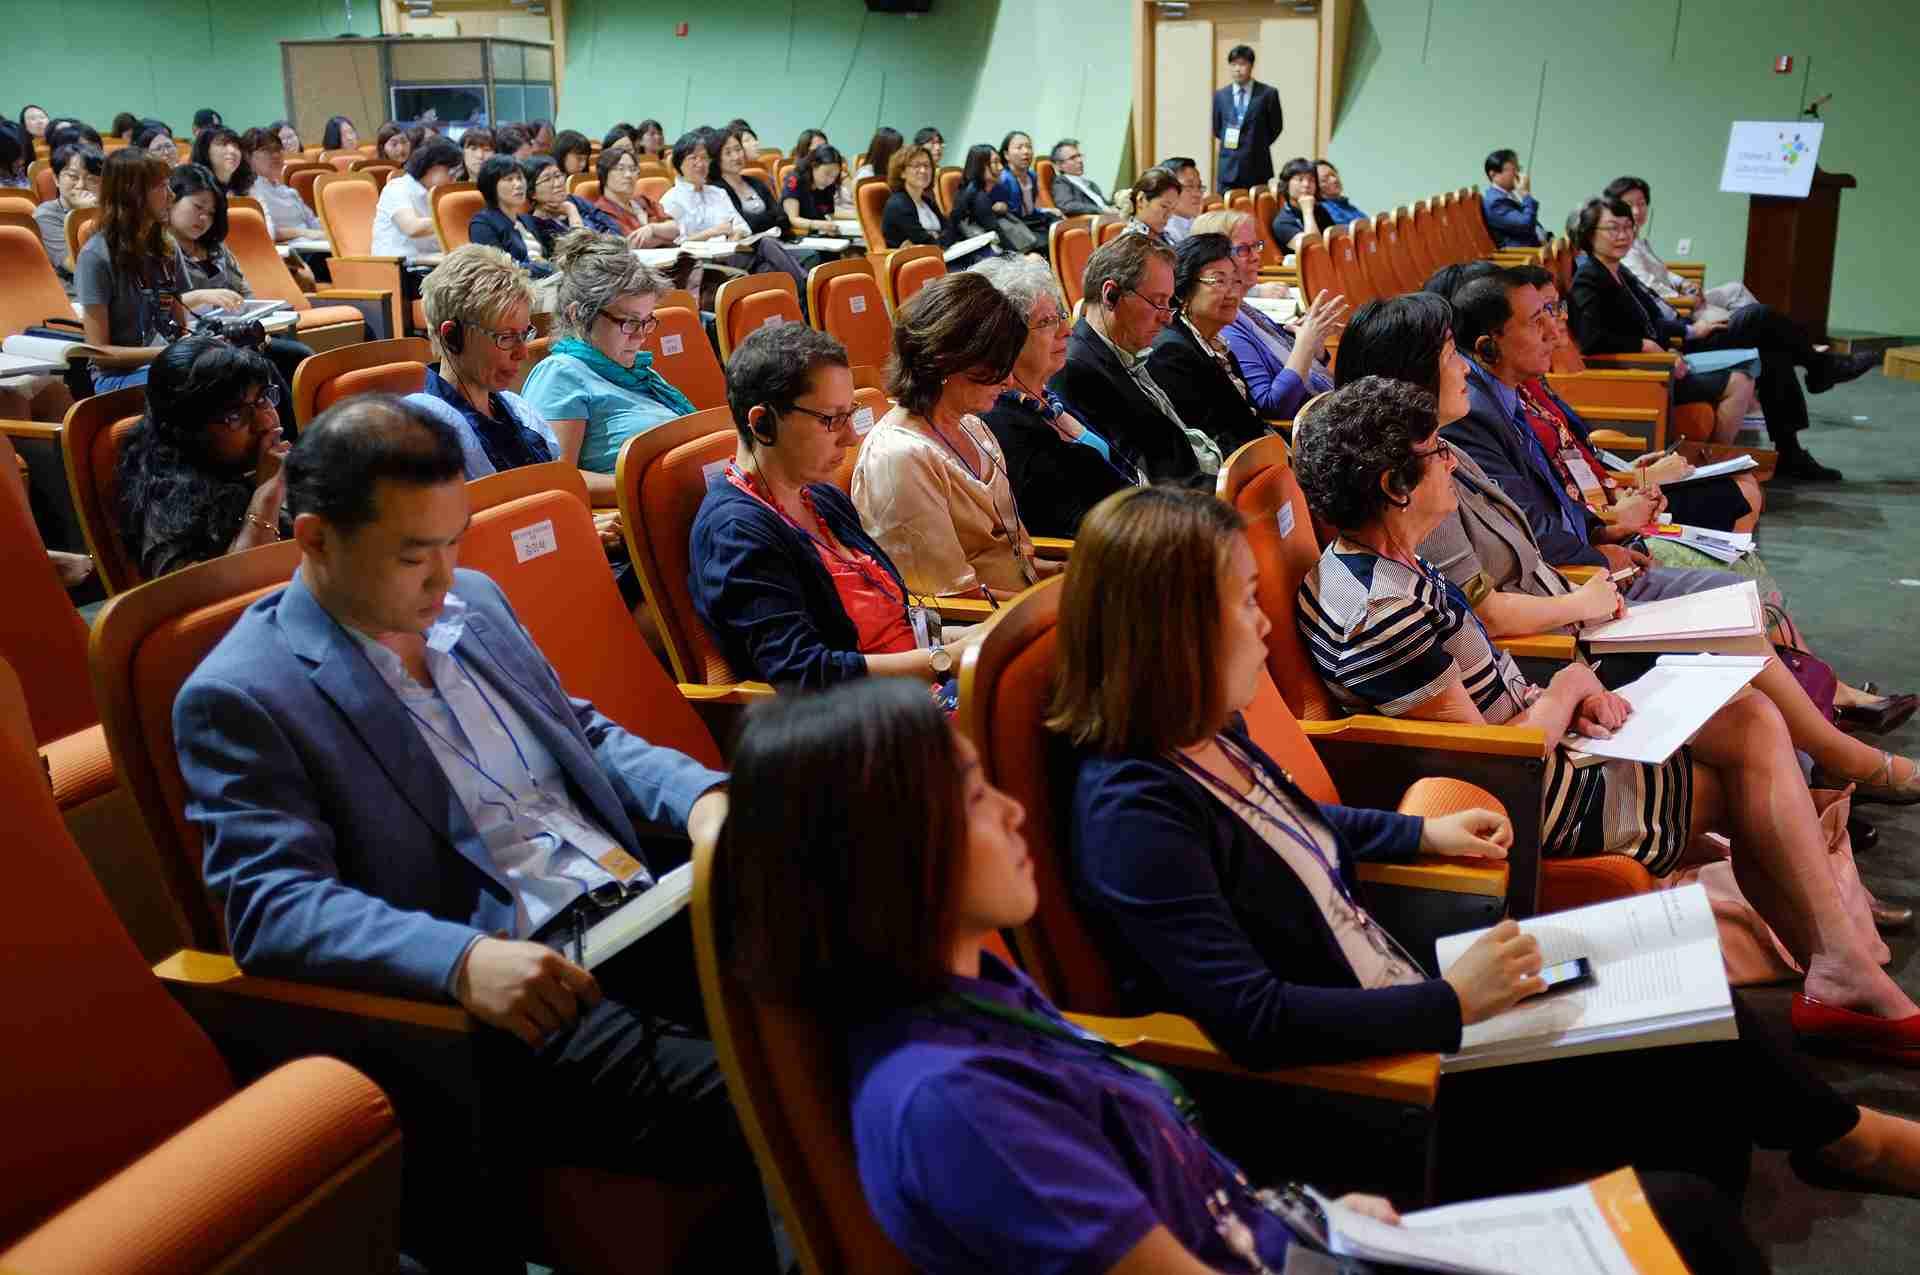 kinder museum frankurt: 3rd asian childrensmuseum conference Auditorium